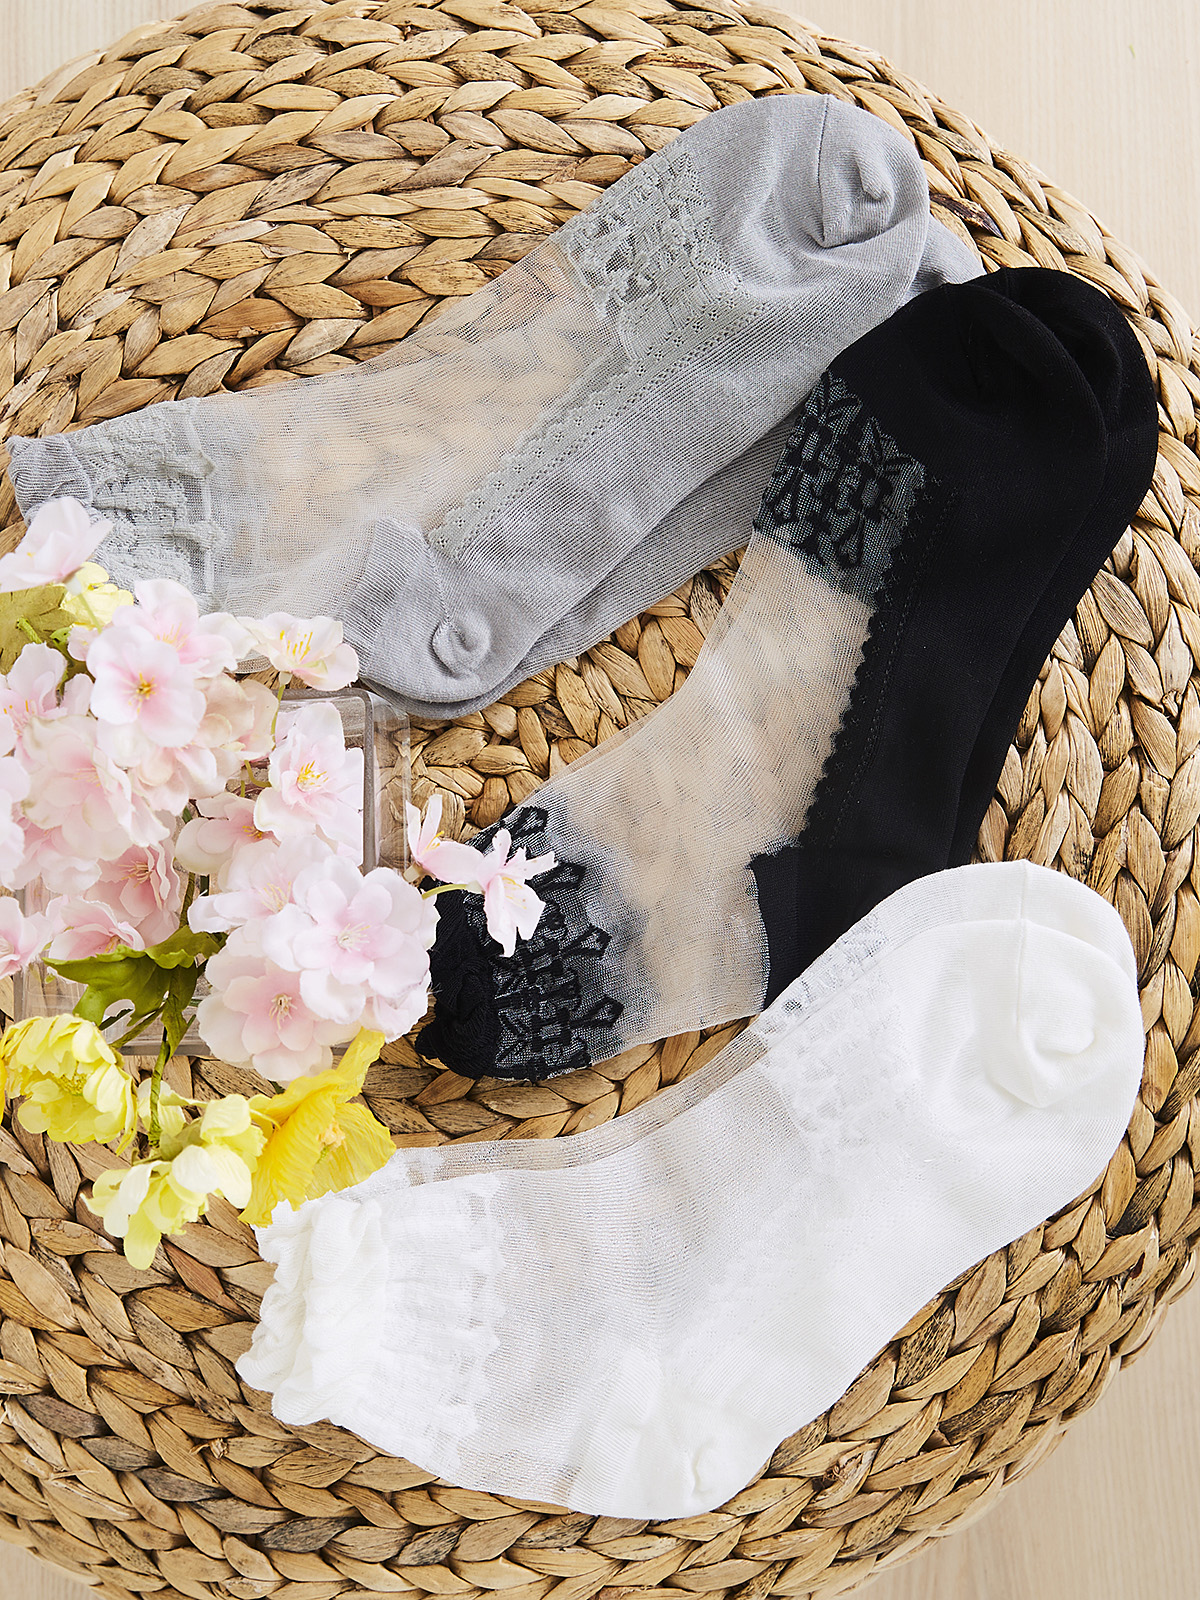 Claudette Sheer Stockings - Set of 3